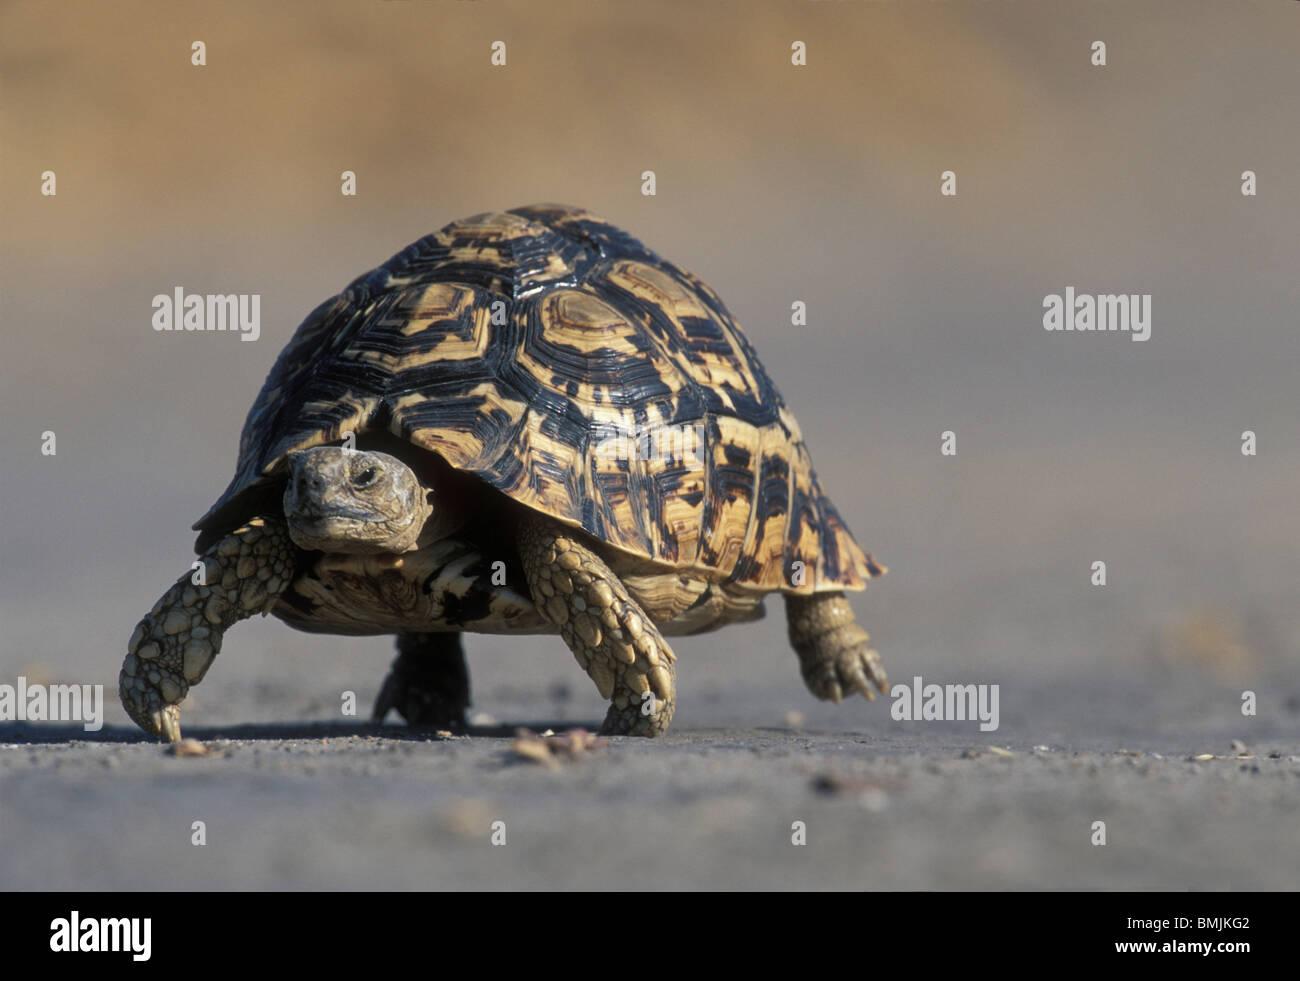 Botswana, Chobe National Park, Leopard Tortoise (Geochelone pardalis) slowly walks through dry sand in Savuti Marsh - Stock Image